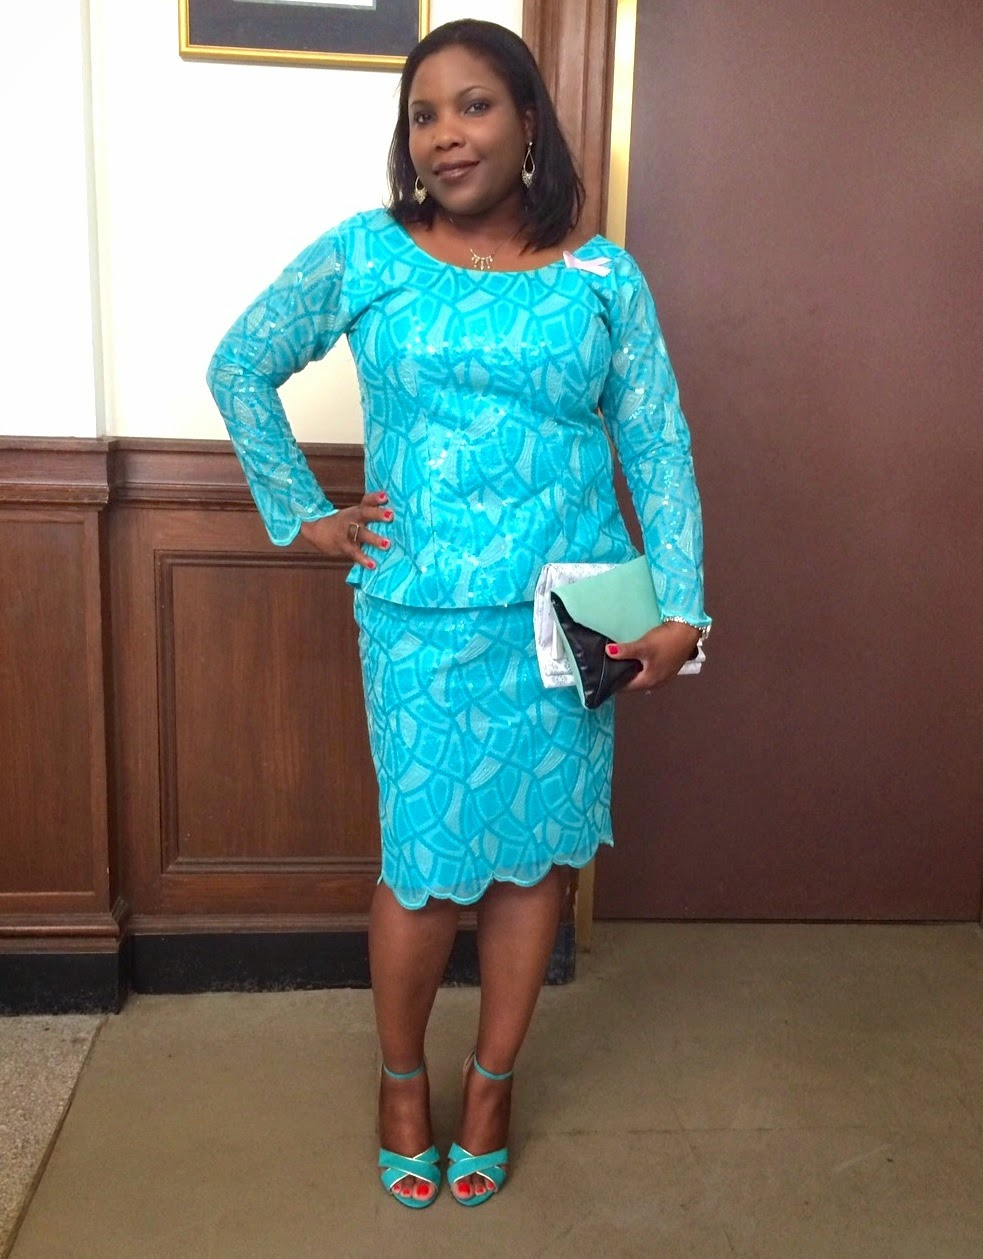 Aqua lace, turqoiuse Lace, Mint lace, Lace pencil skirt, mint and black envelope clutch style and co